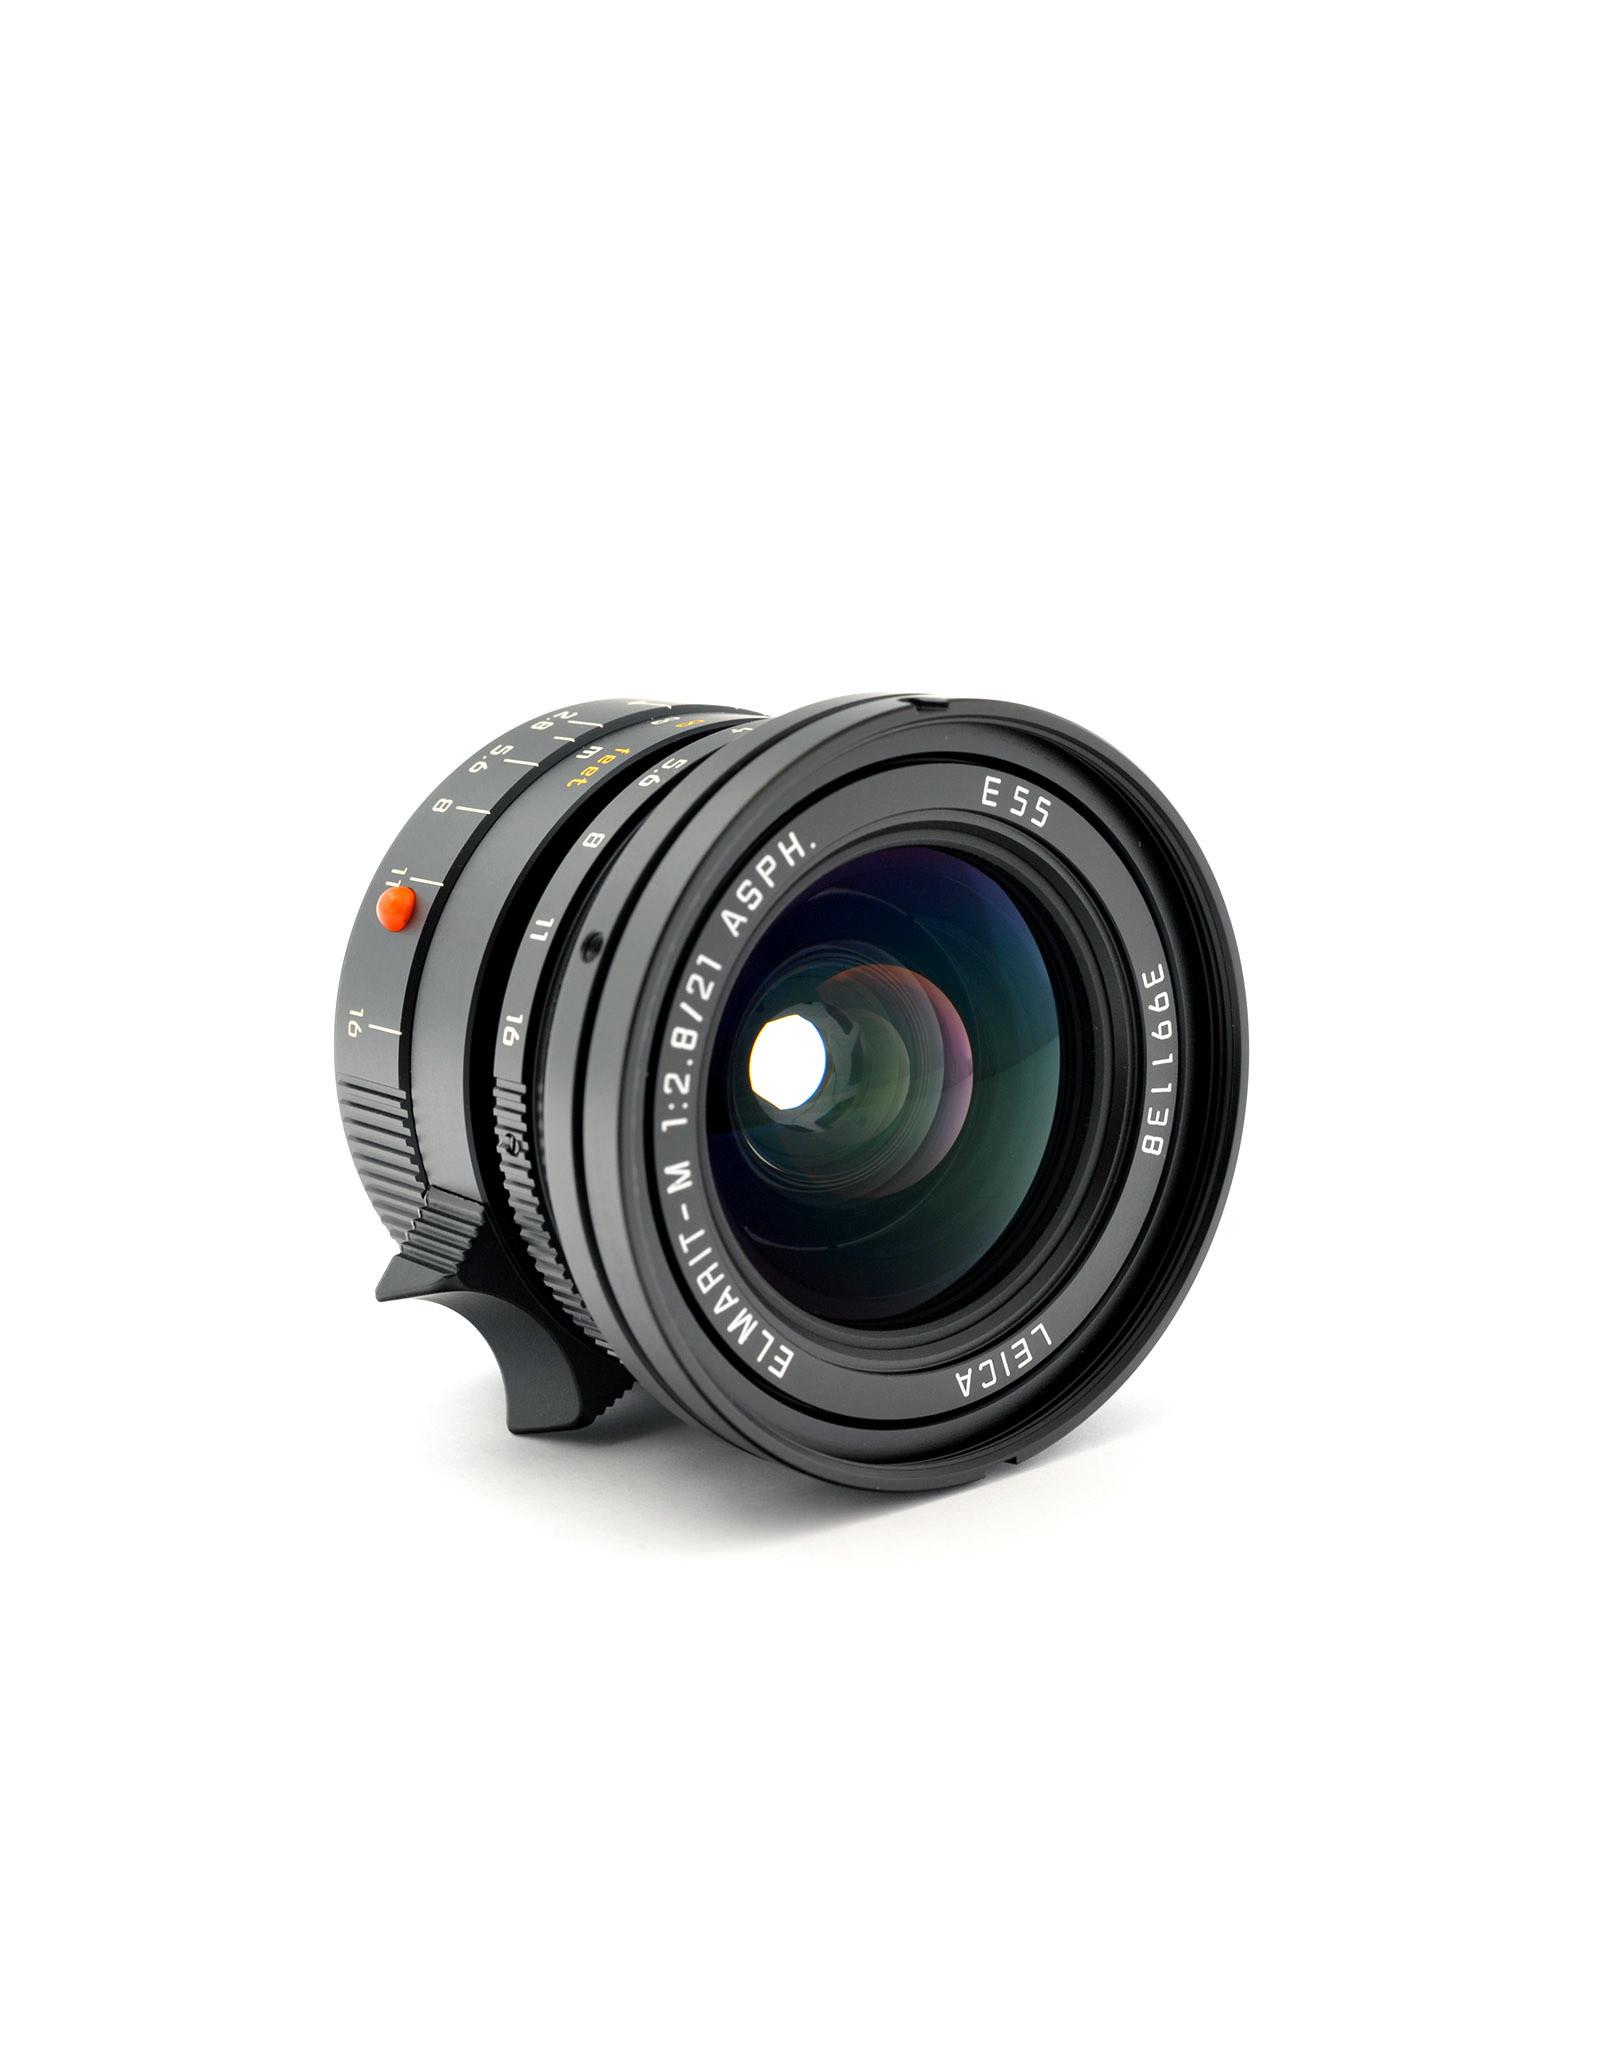 Leica Leica 21mm f2.8 Elamrit-M ASPH 6 bit   ALC121403